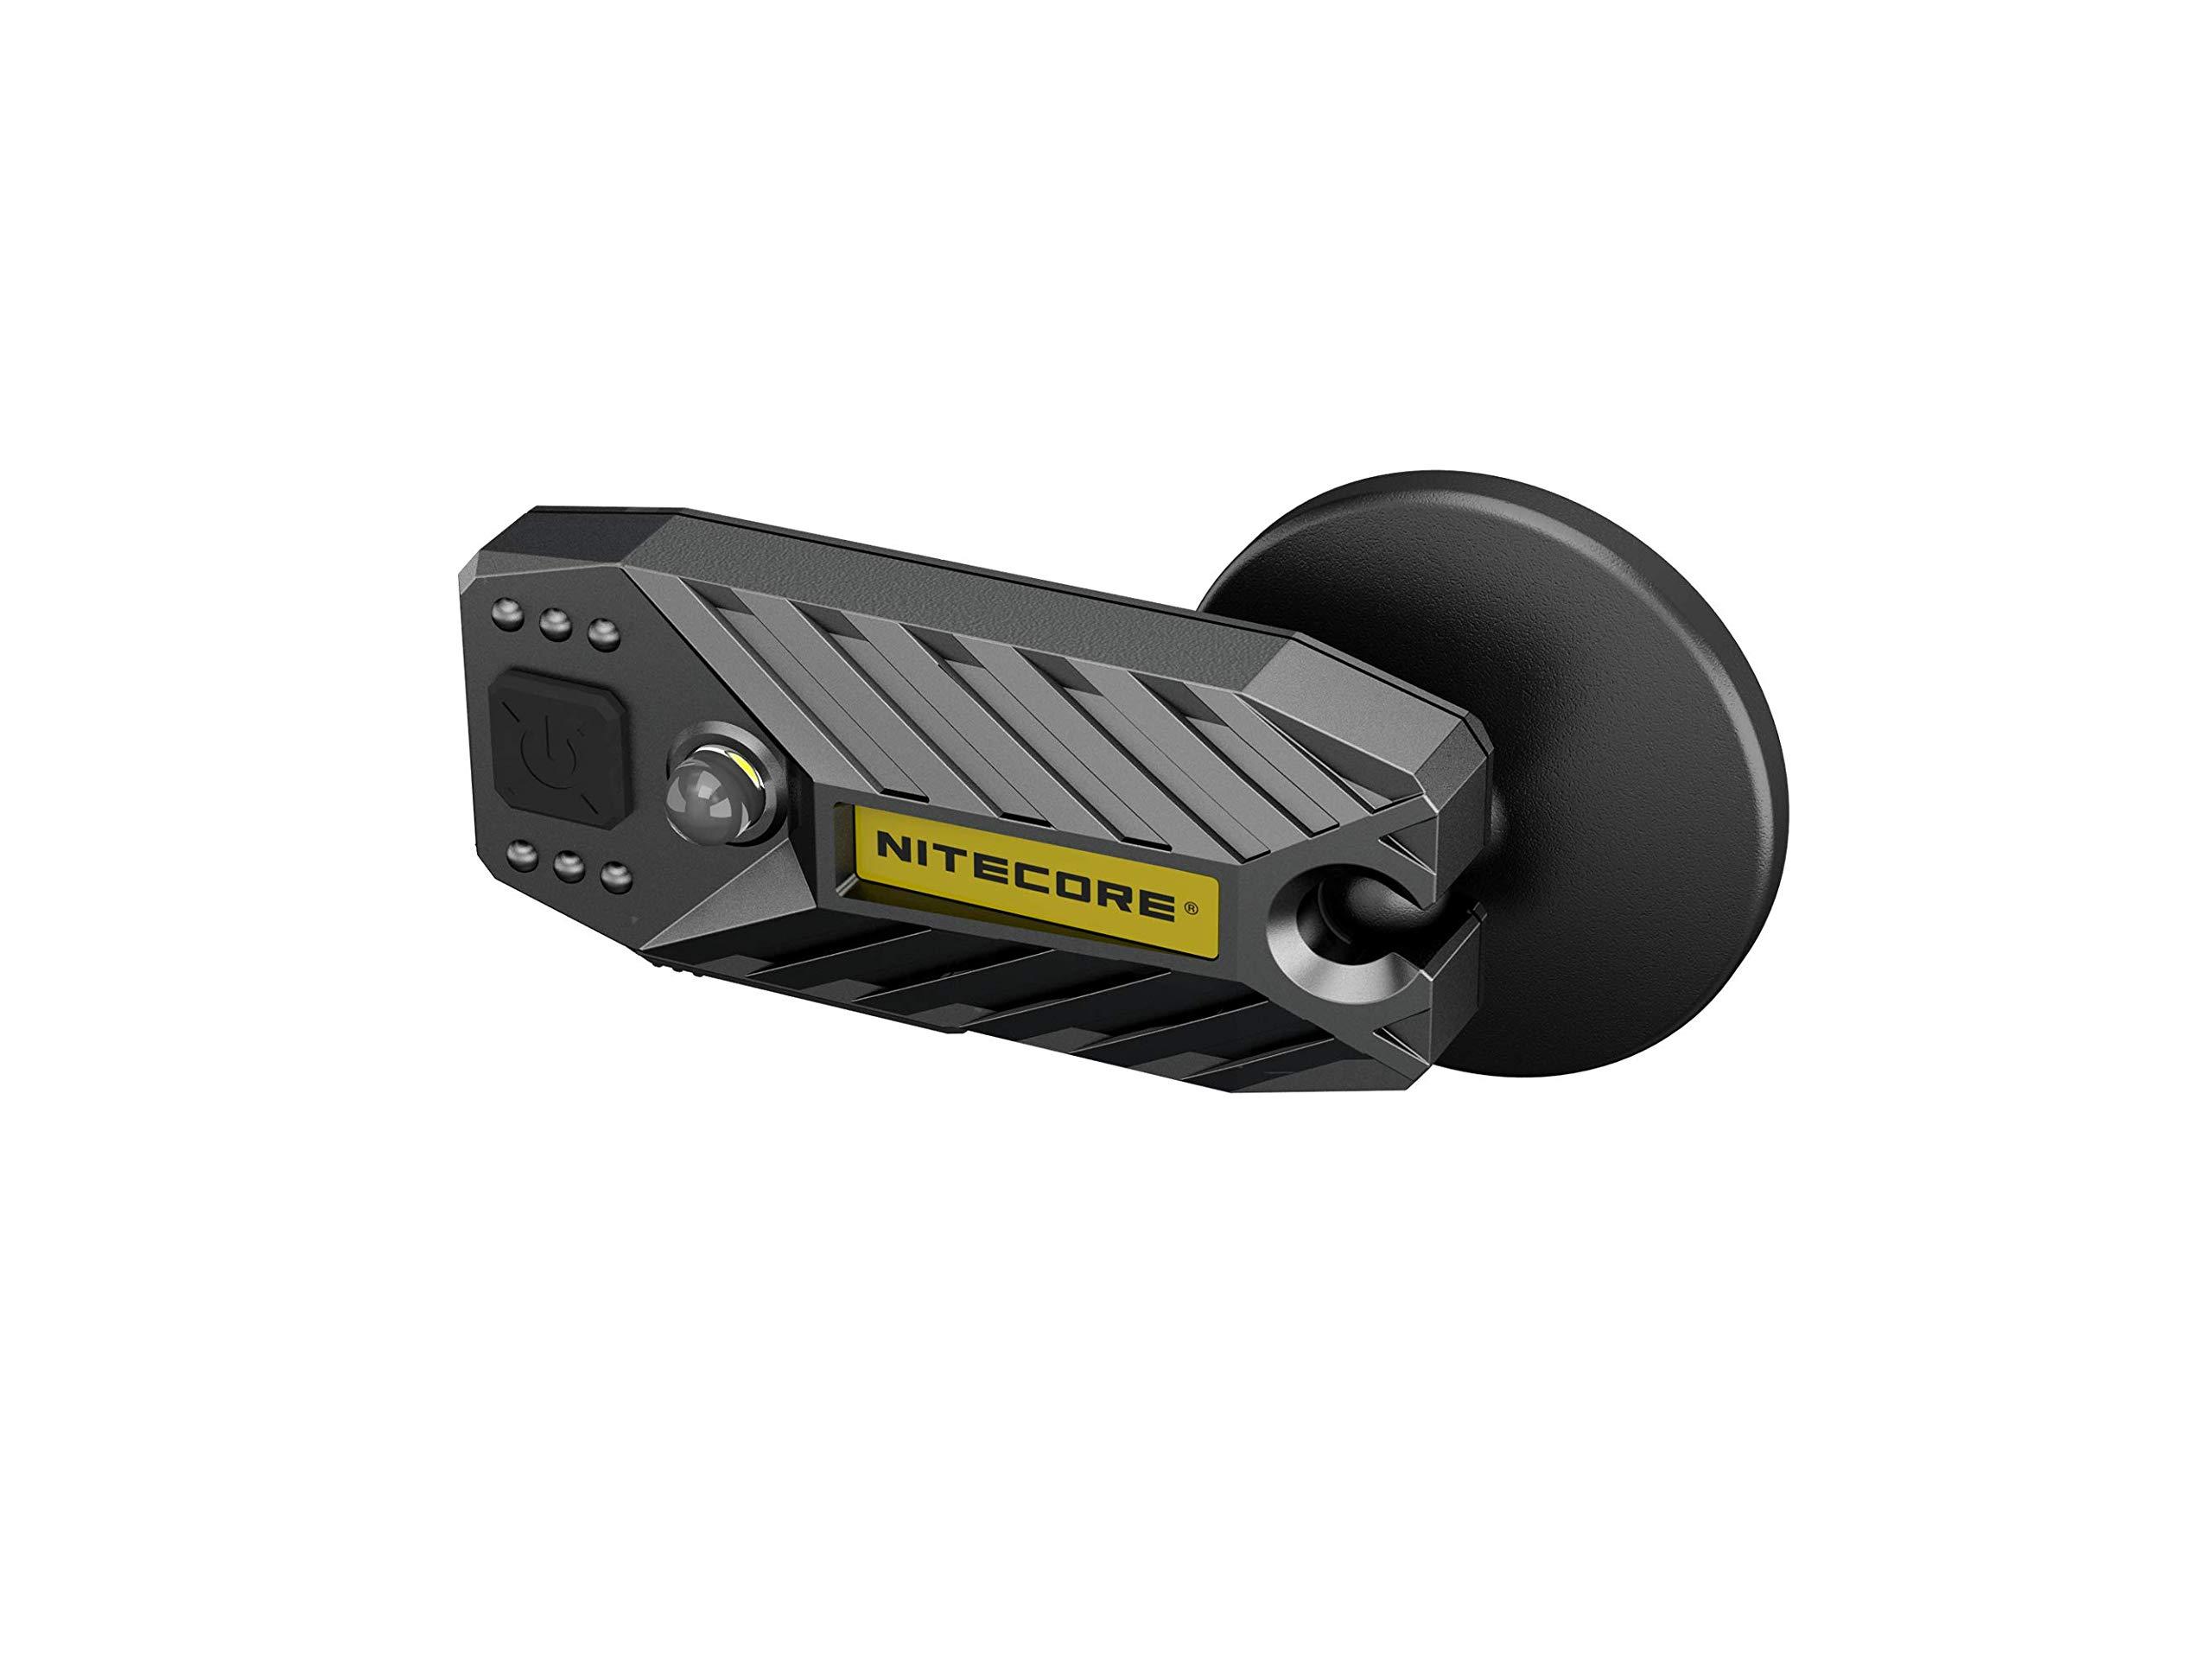 Linternas : Nitecore Sysmax Industrial 45 Lm T360M...